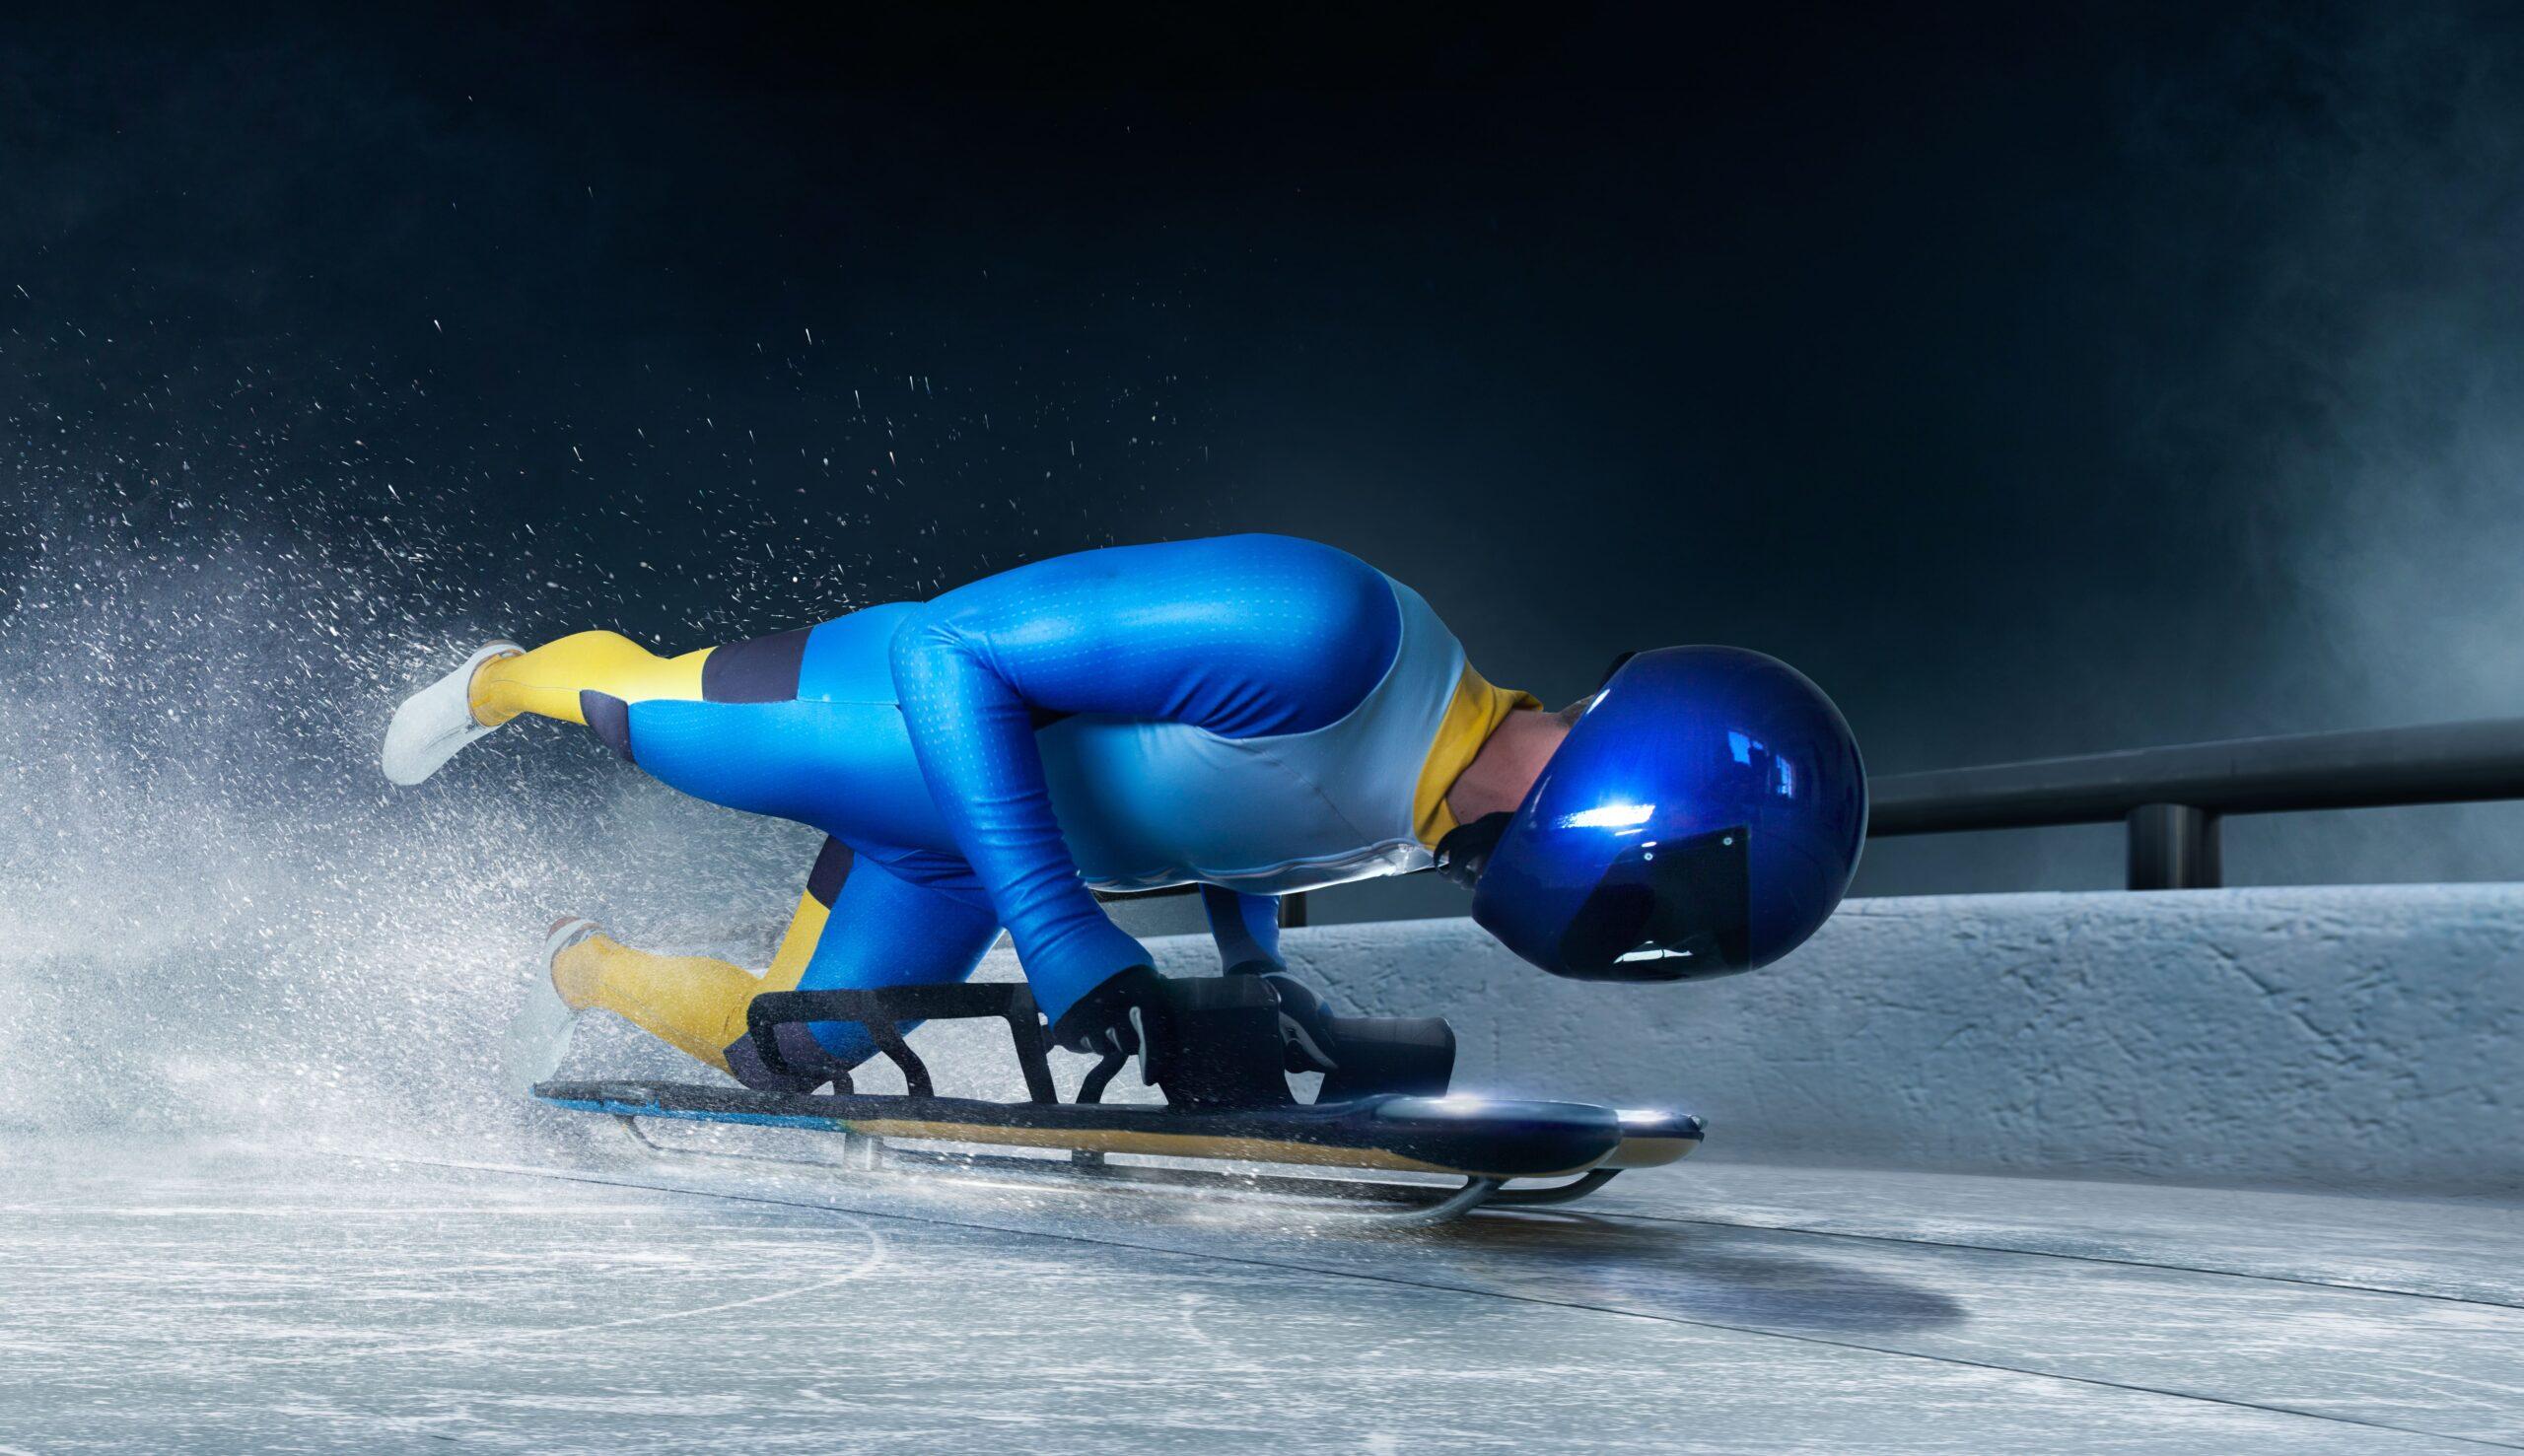 Athlete launching on to skeleton to start race.